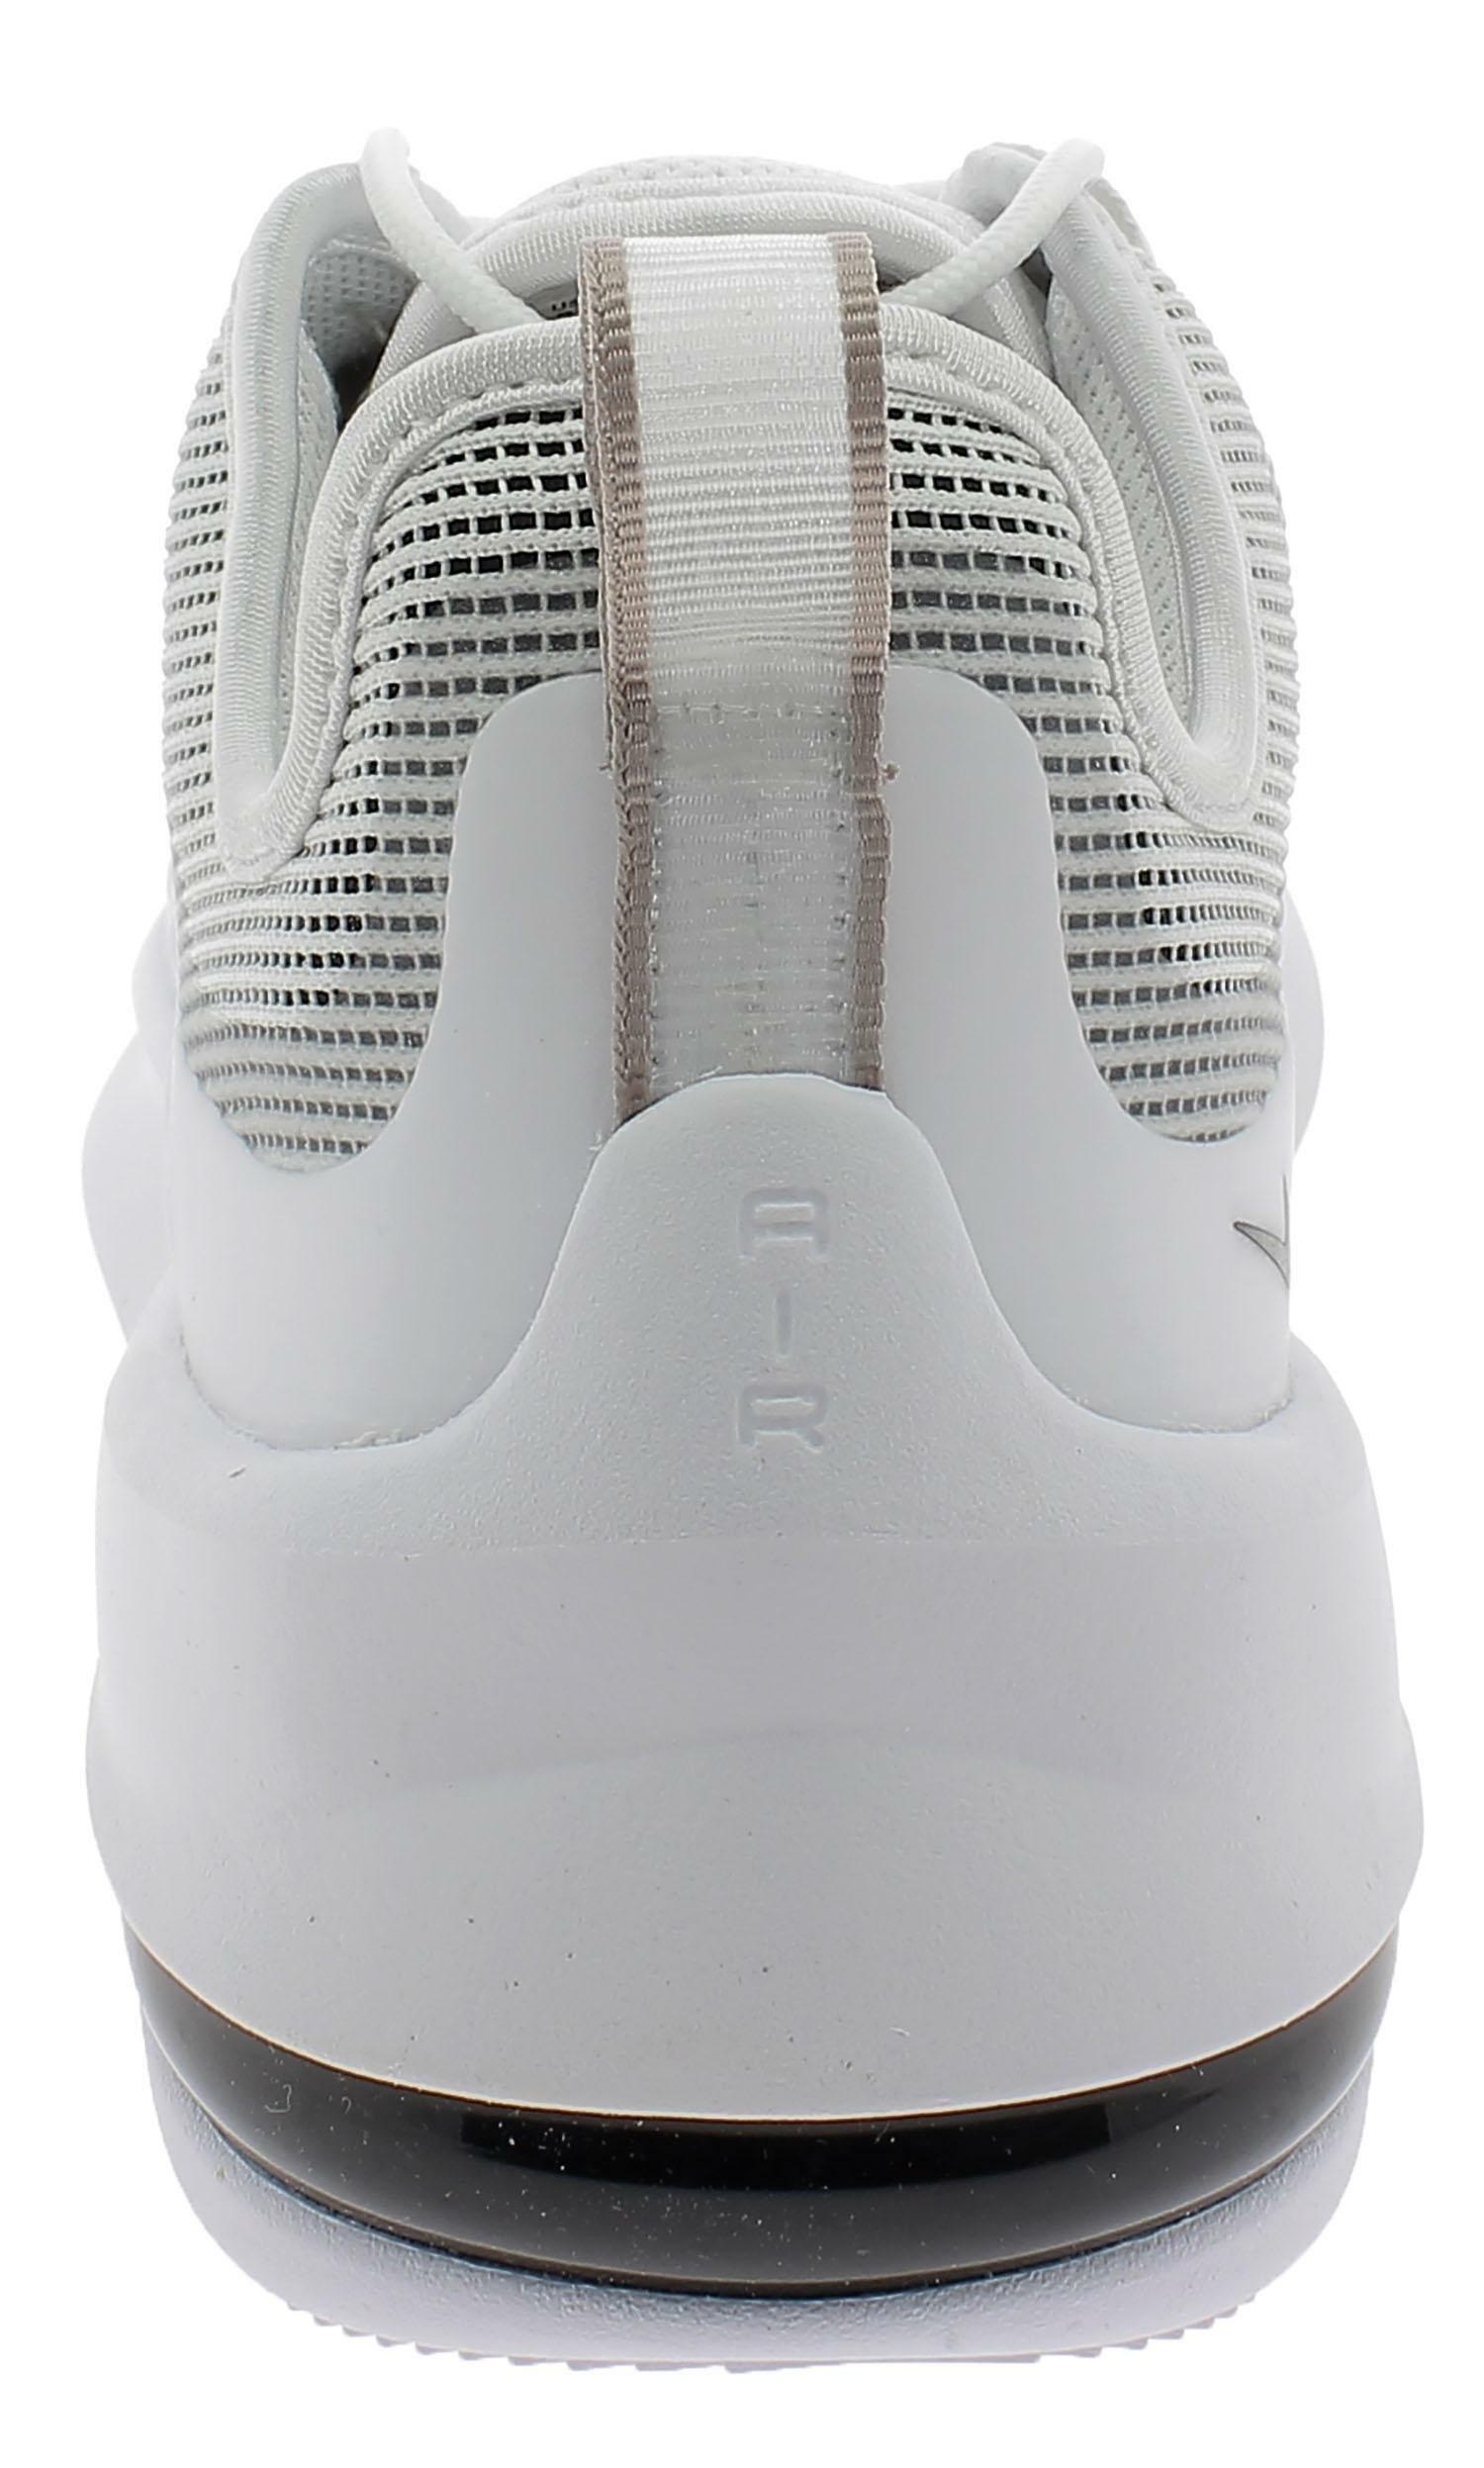 Nike air max axis prem scarpe sportive uomo bianche aa2148102